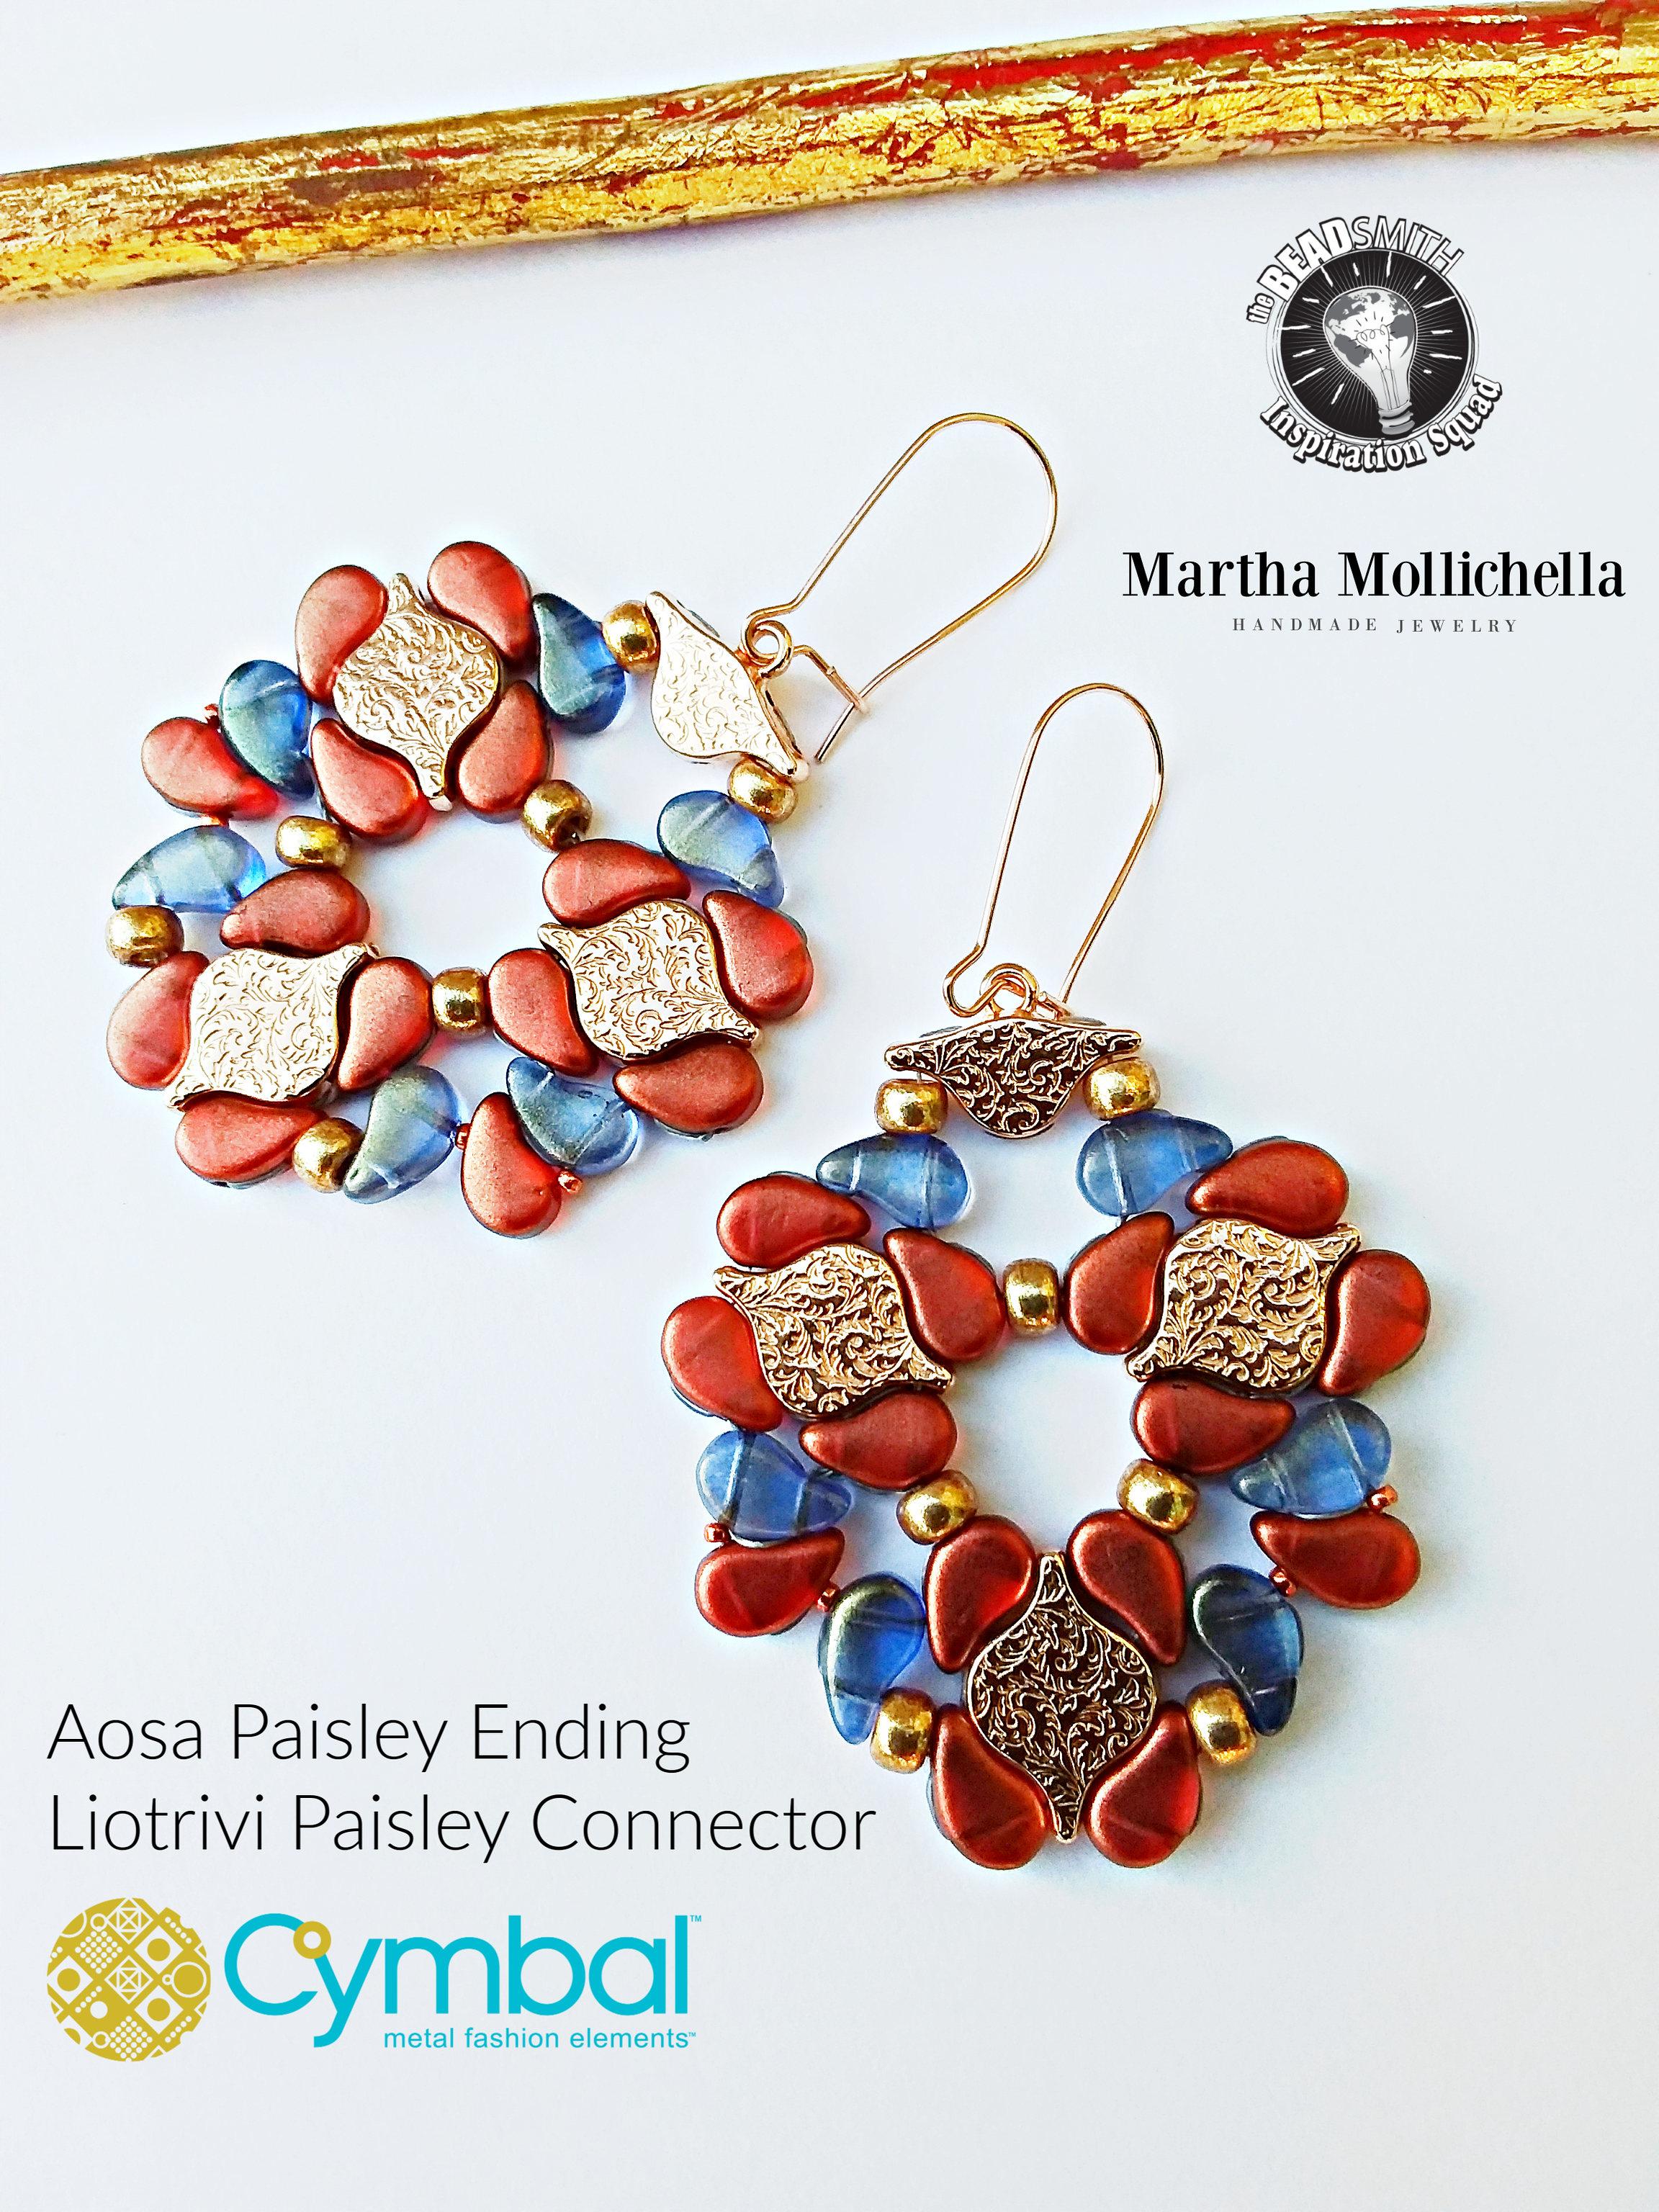 Aosa Paisley Ending Liotrivi Connector Cymbal elements by Martha Mollichella